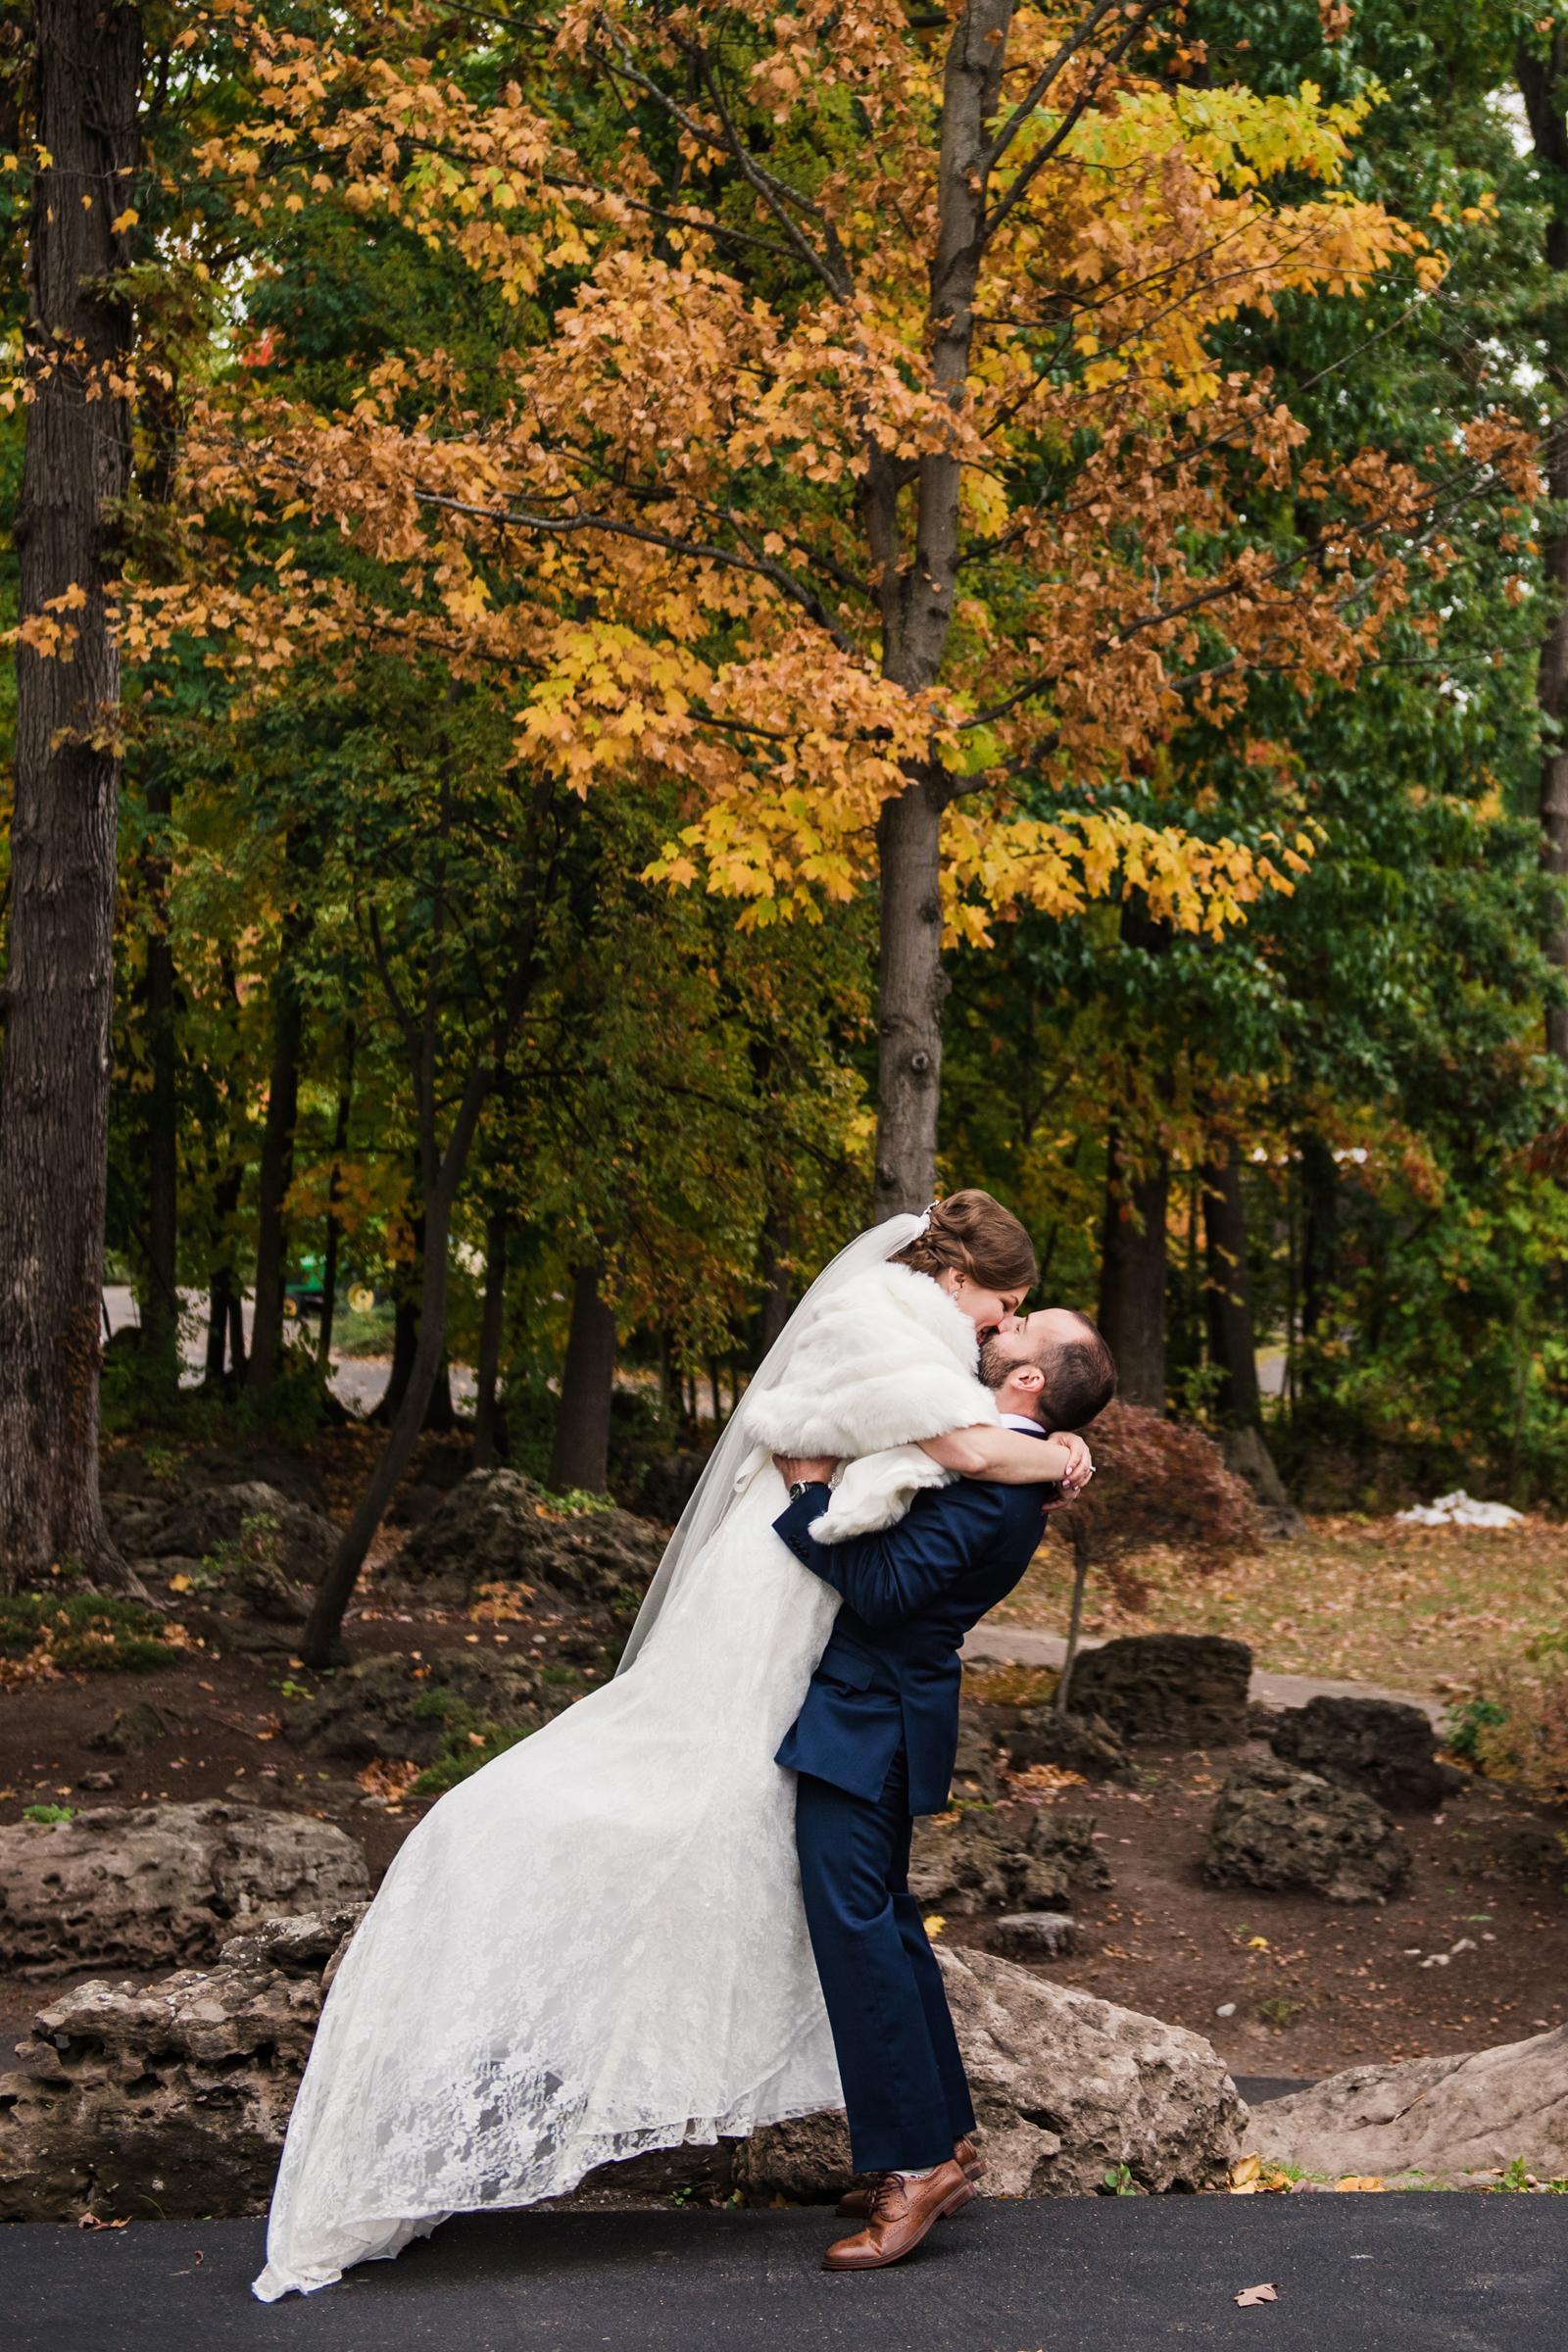 Shadow_Lake_Rochester_Wedding_JILL_STUDIO_Rochester_NY_Photographer_DSC_6109.jpg